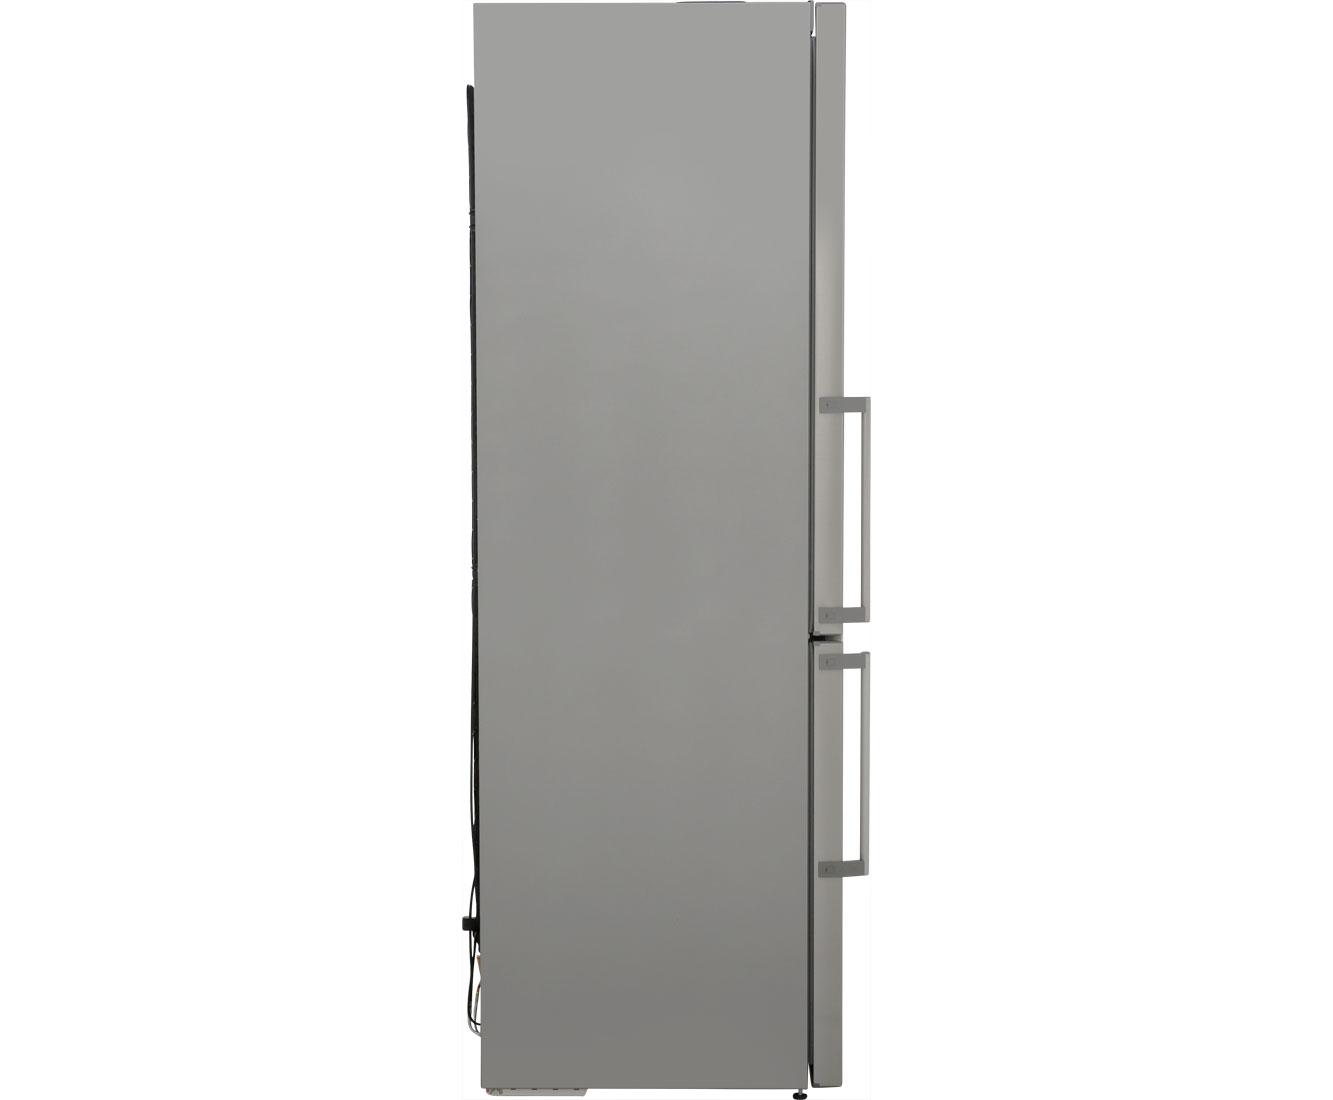 Bosch Kühlschrank Kgn 36 Xi 45 : Bosch kgn36xi45 kühl gefrierkombination serie 6 no frost freistehend